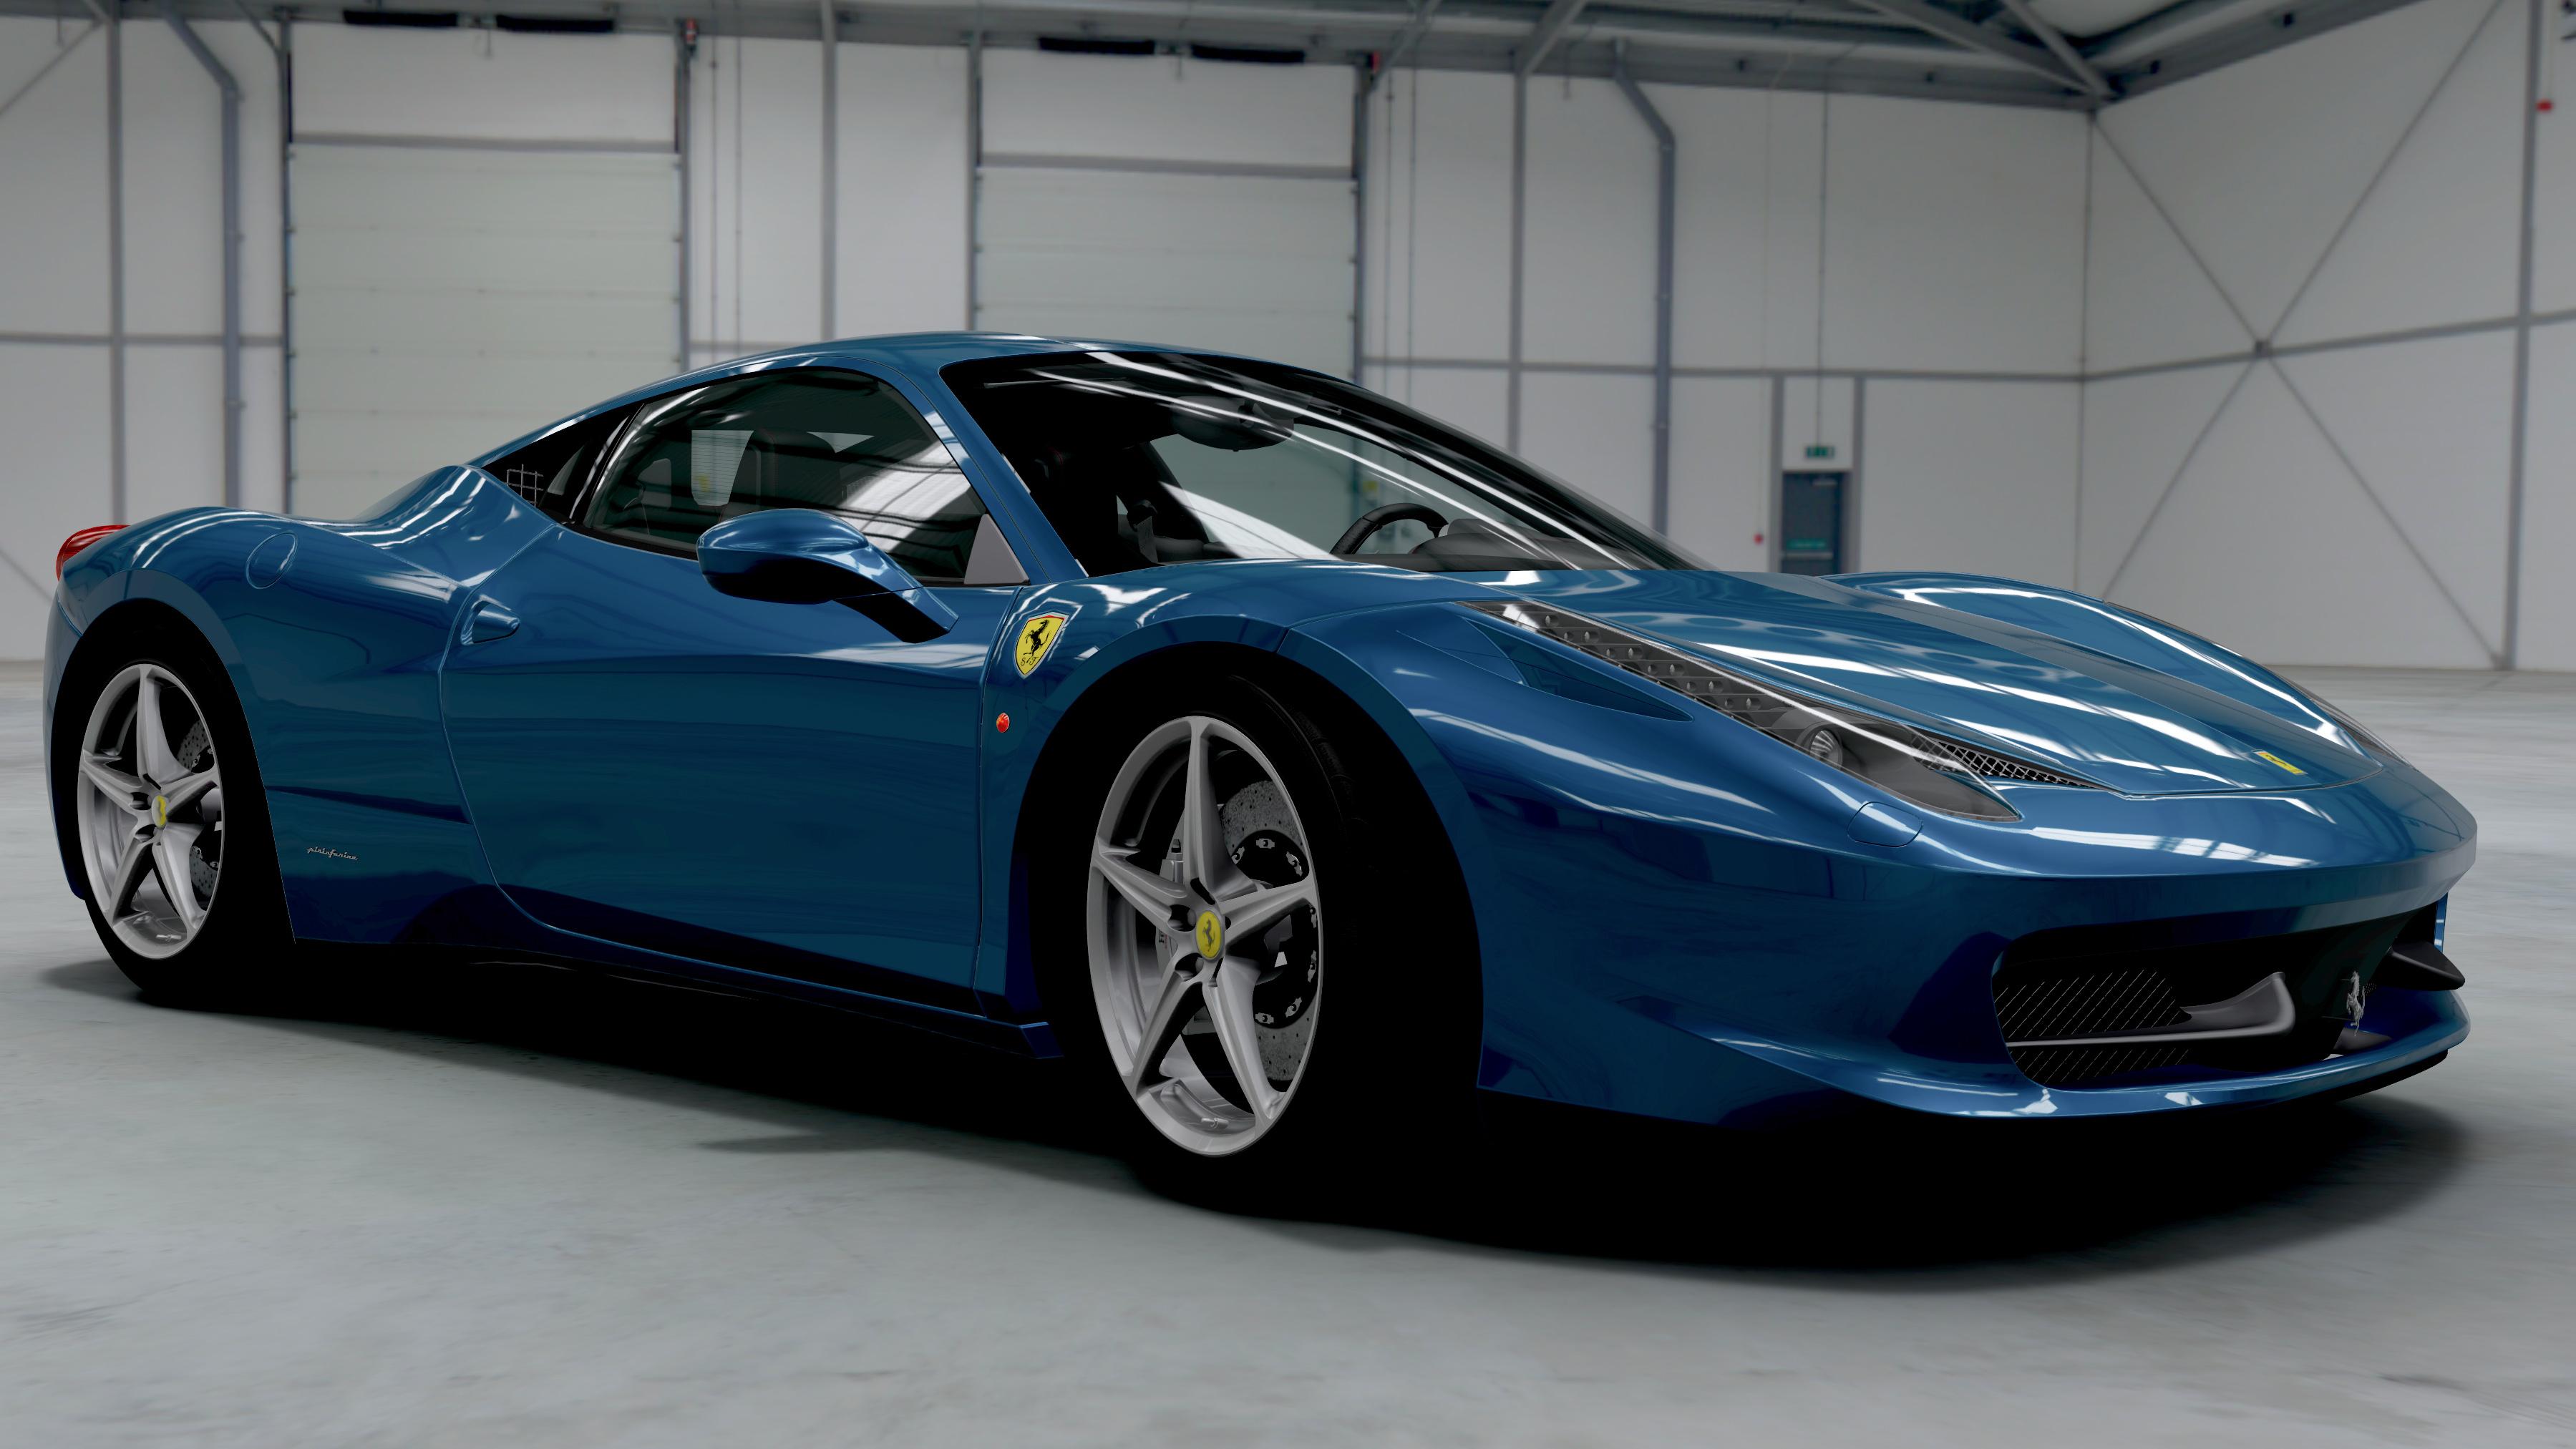 interested about vehicles love to have a ferrari 458 italia wallpaper - Ferrari 458 Blue Wallpaper